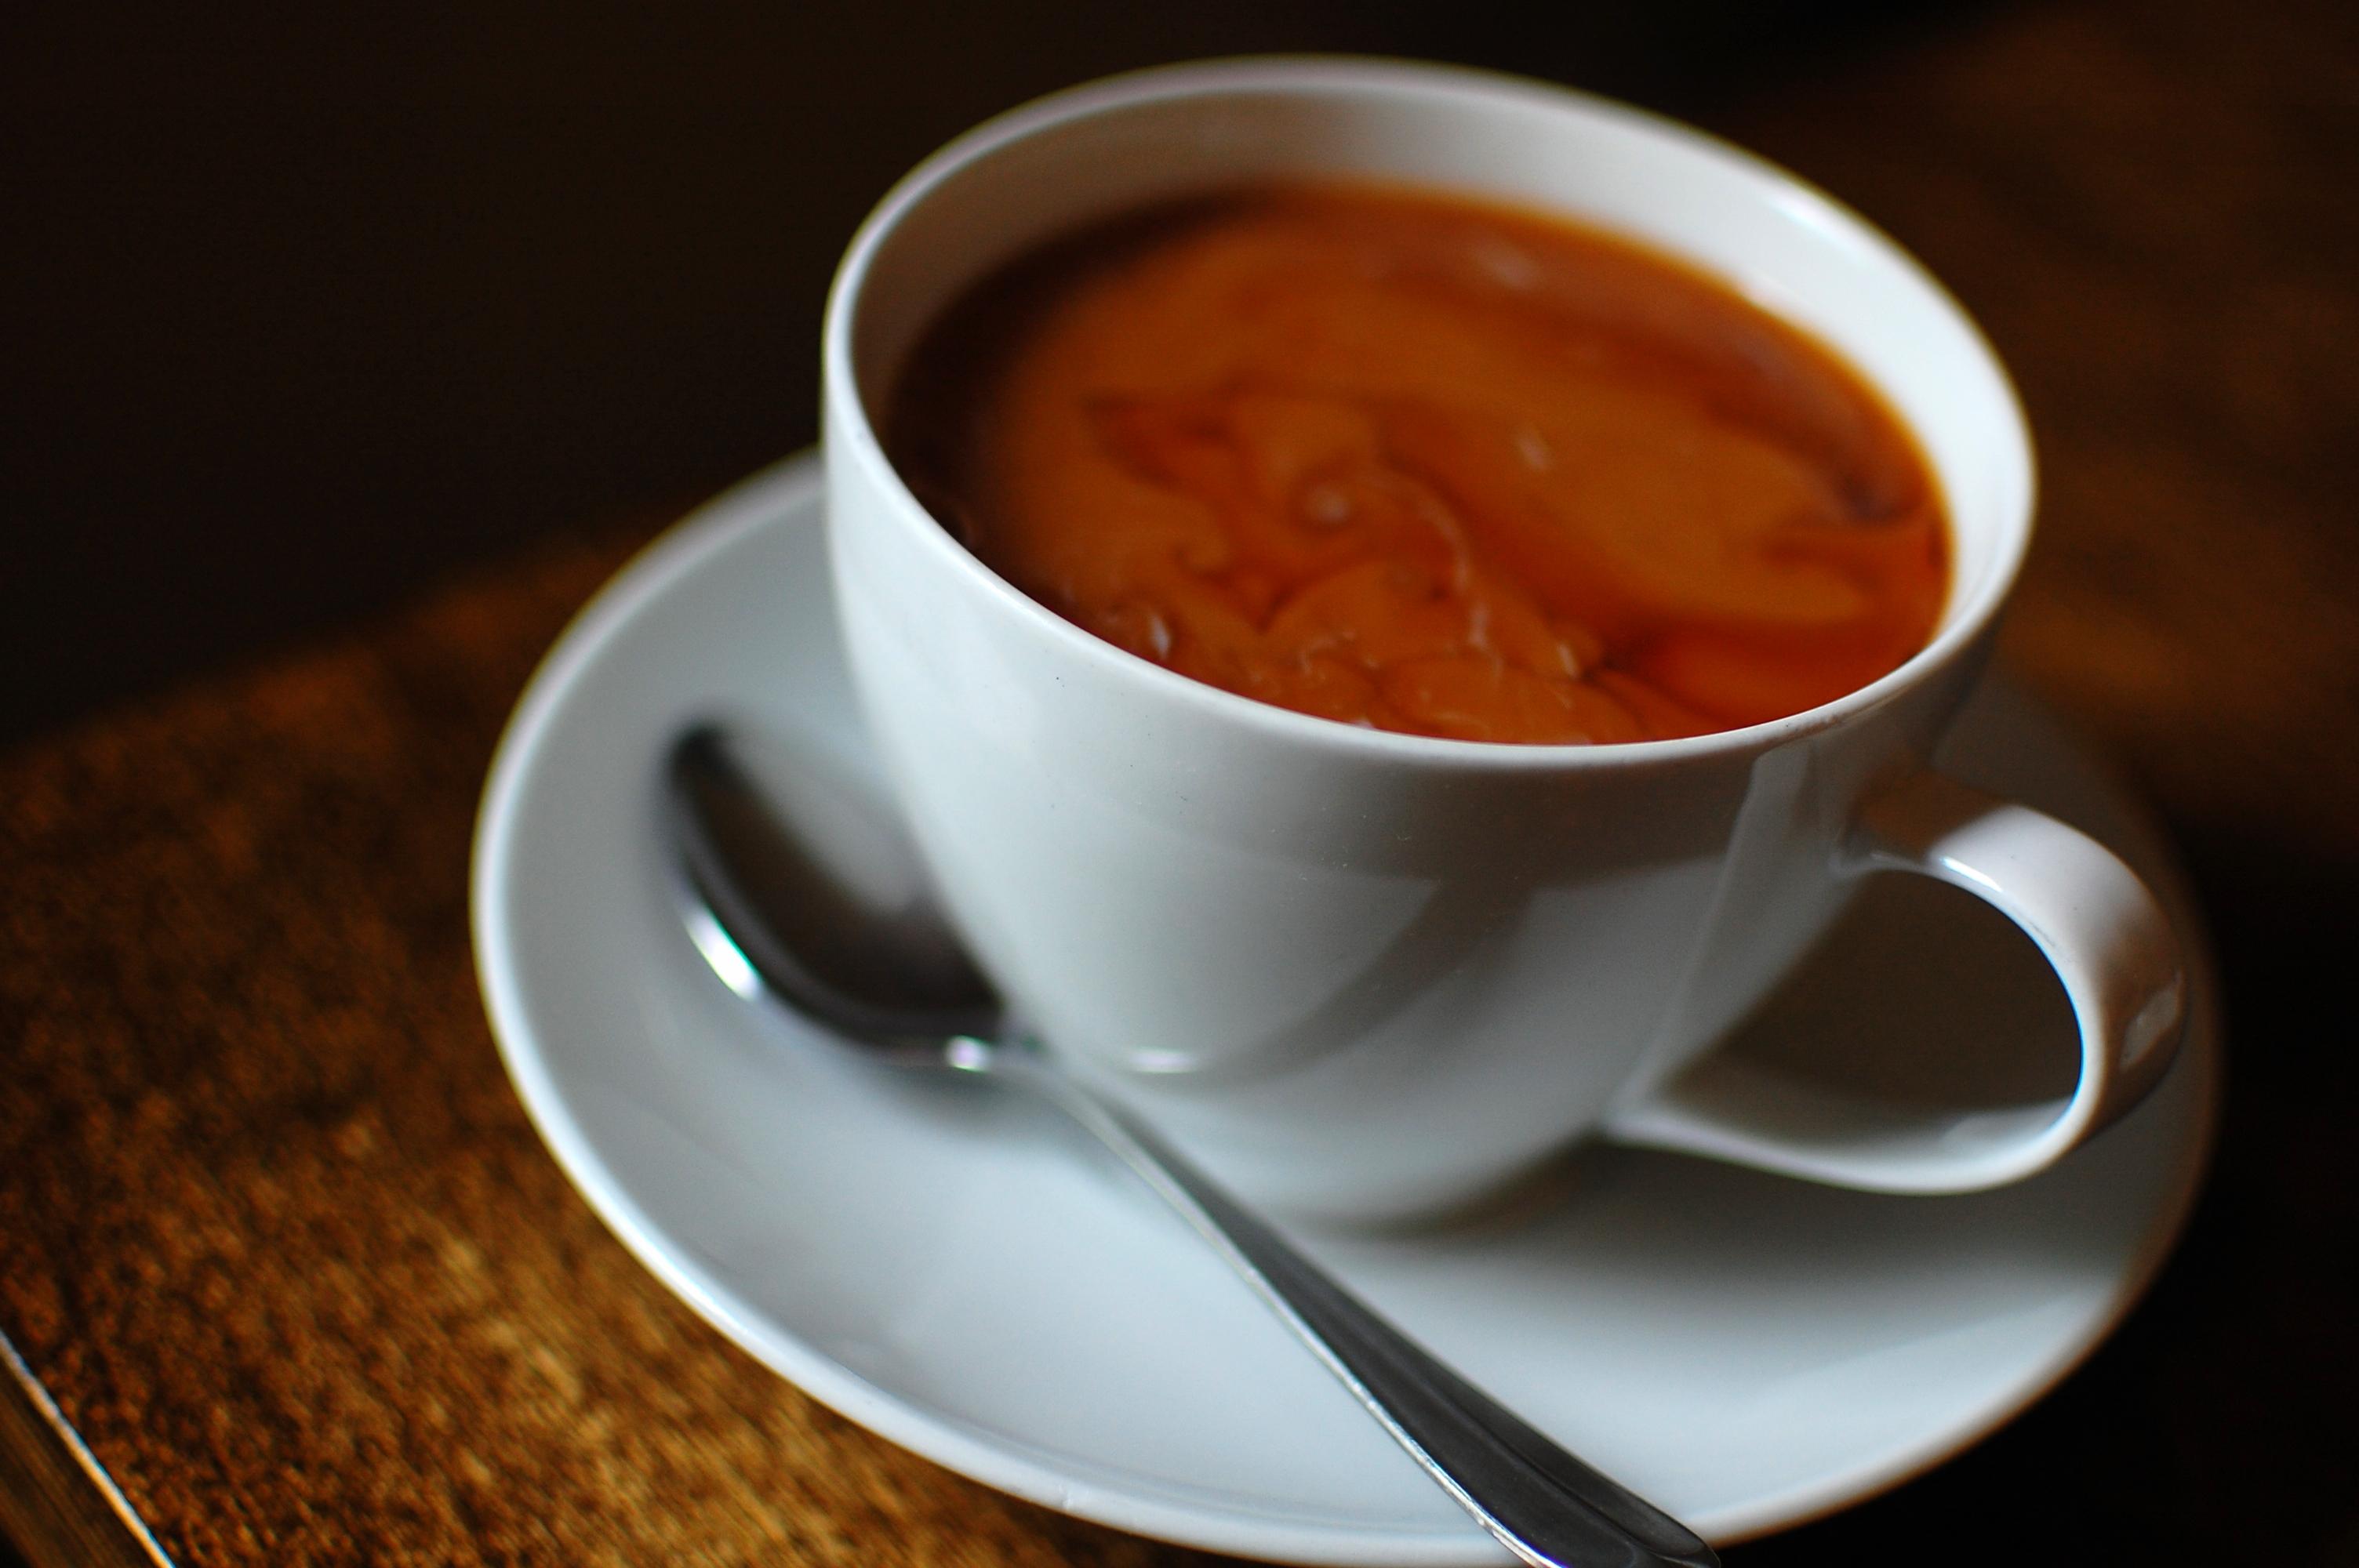 fruity tasting coffee